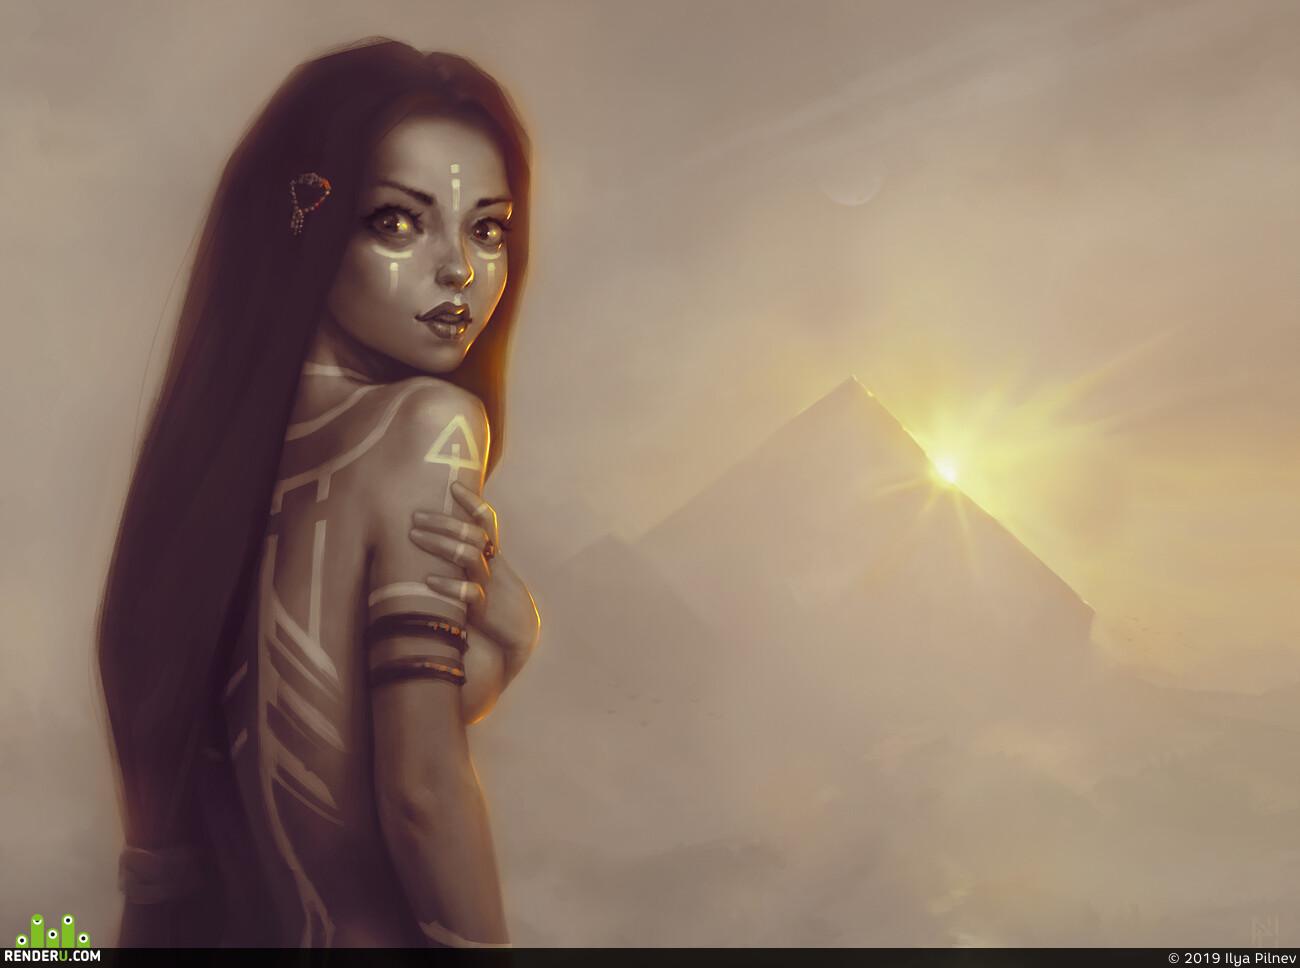 жрица, свет, пирамида, солнце